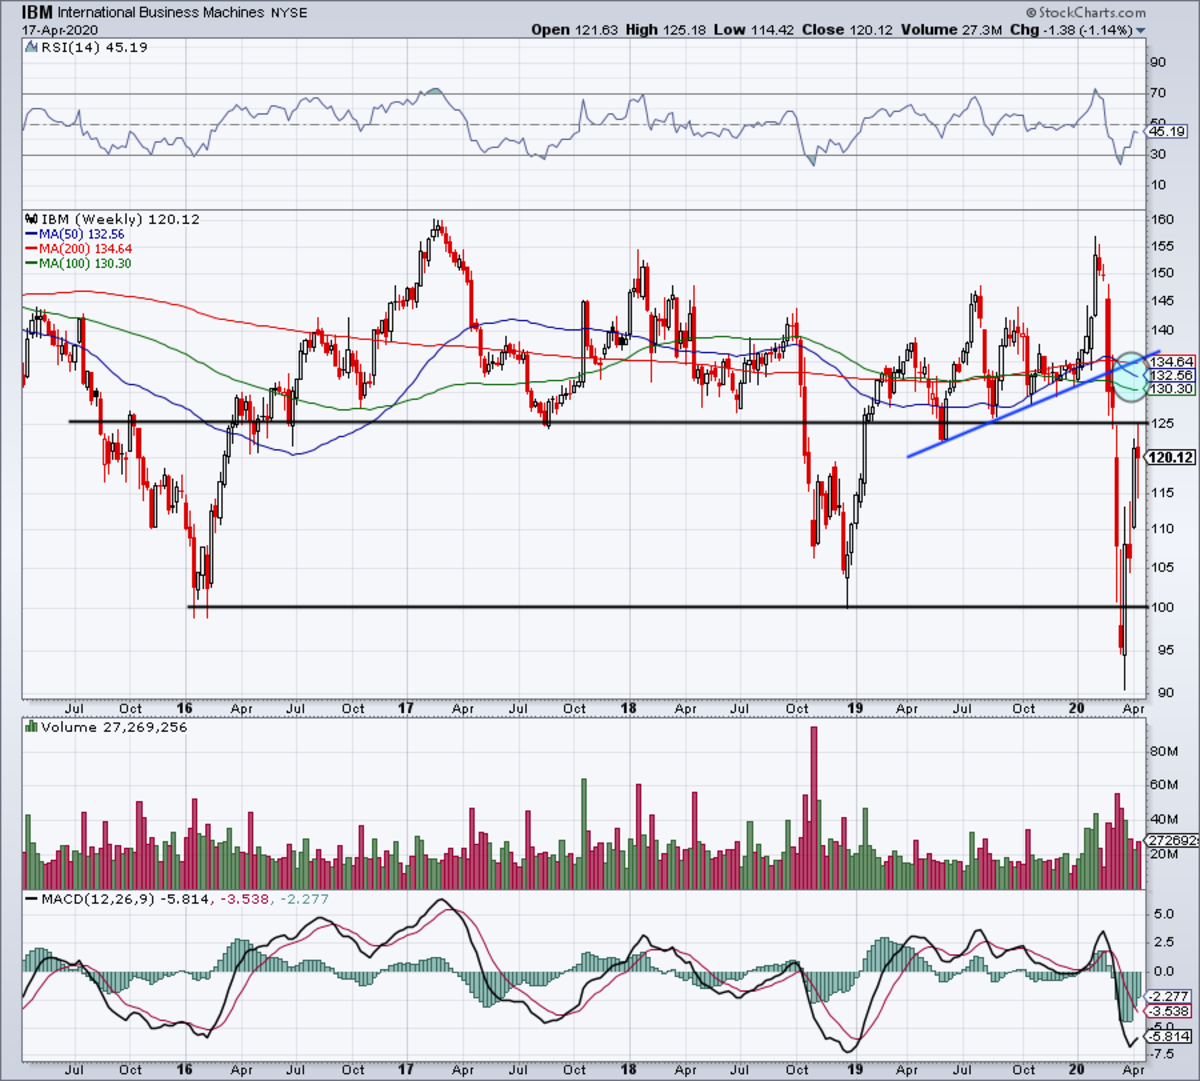 Weekly chart of IBM stock.